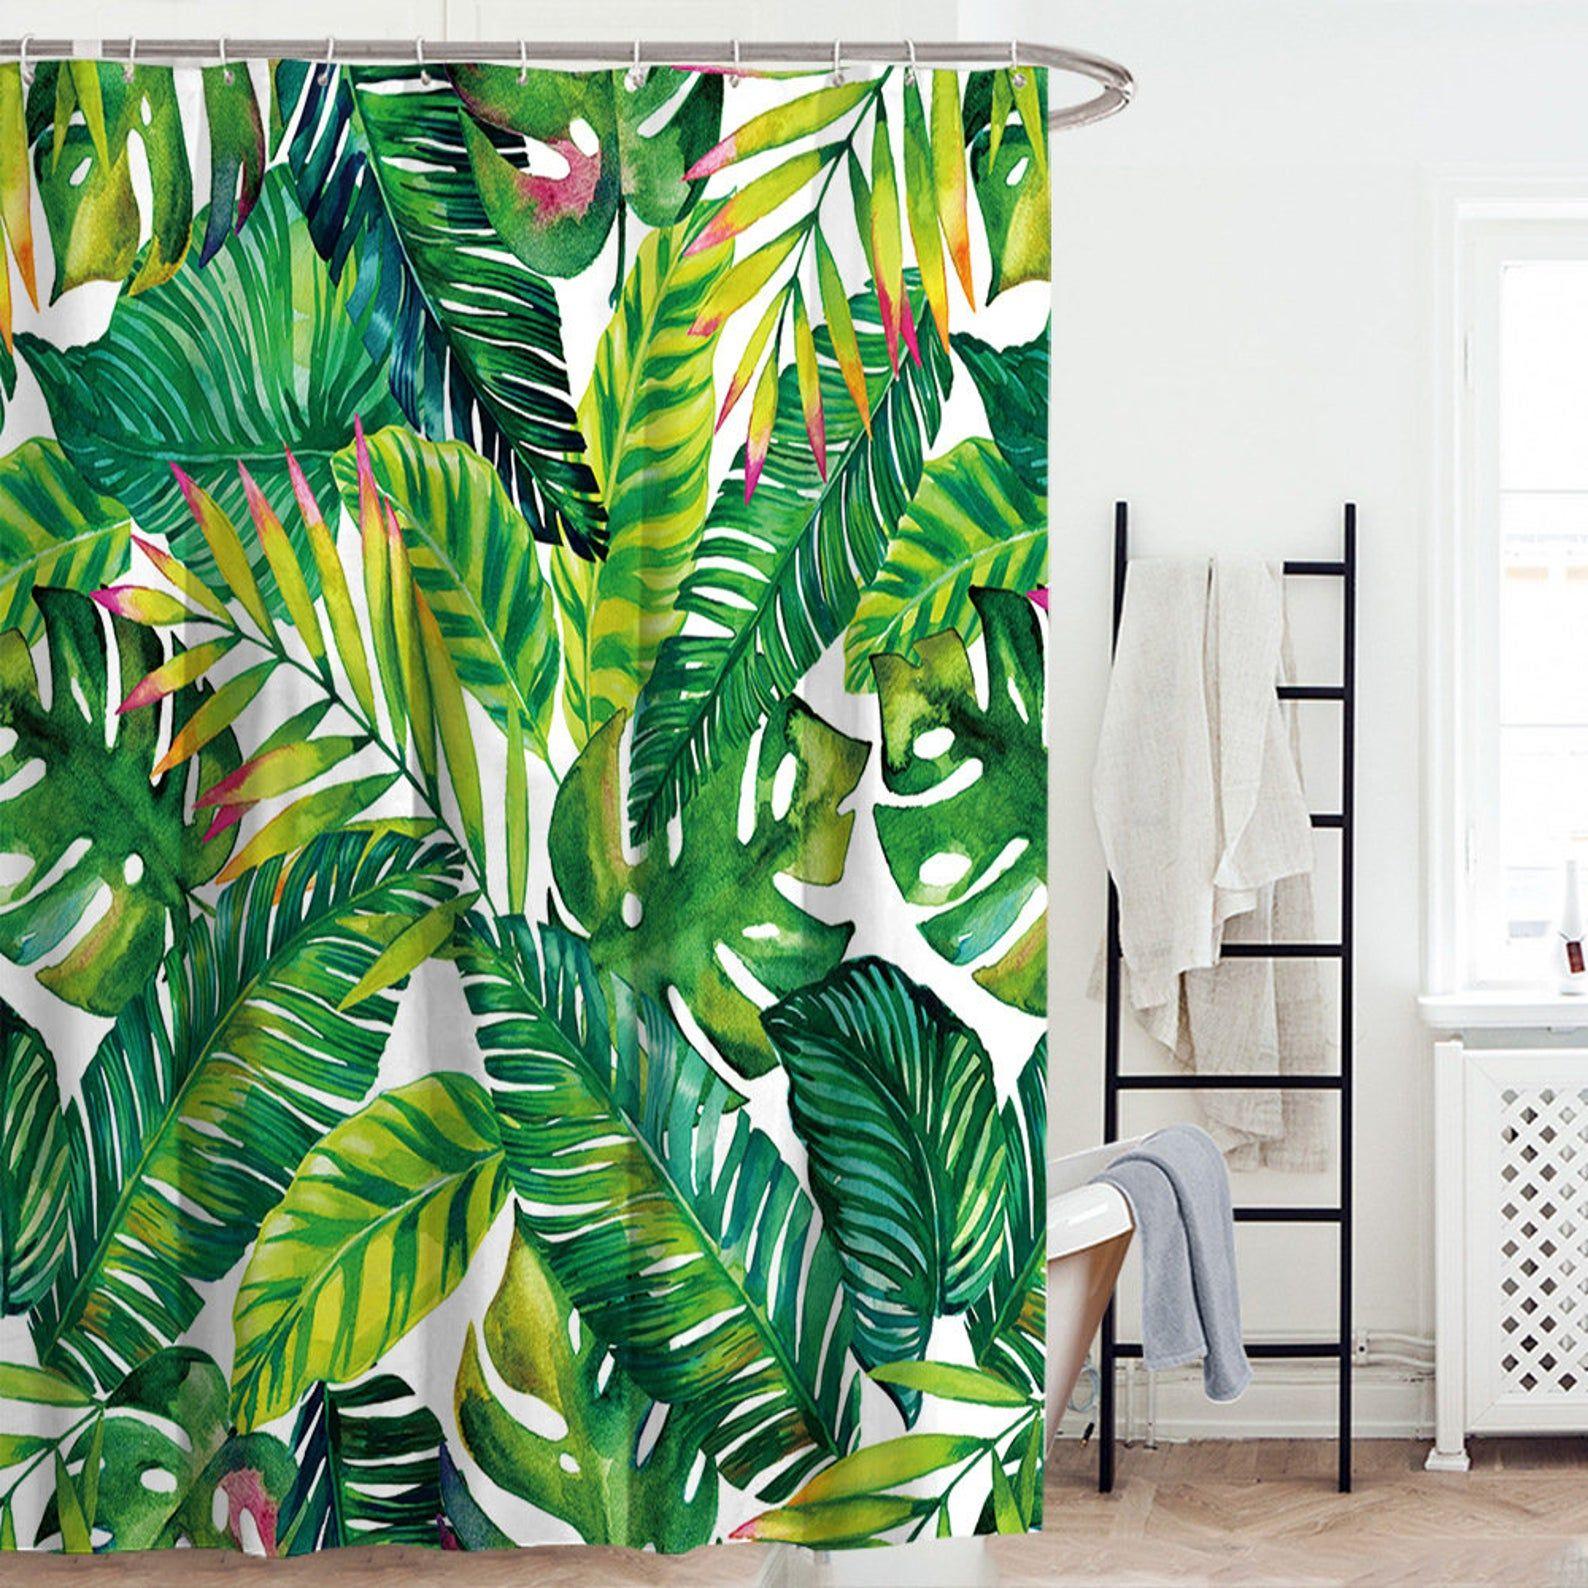 Tropical Banana Leaf Shower Curtain Bath For Bathroom Fiber Etsy Banana Leaf Shower Curtain Shower Curtain Curtains